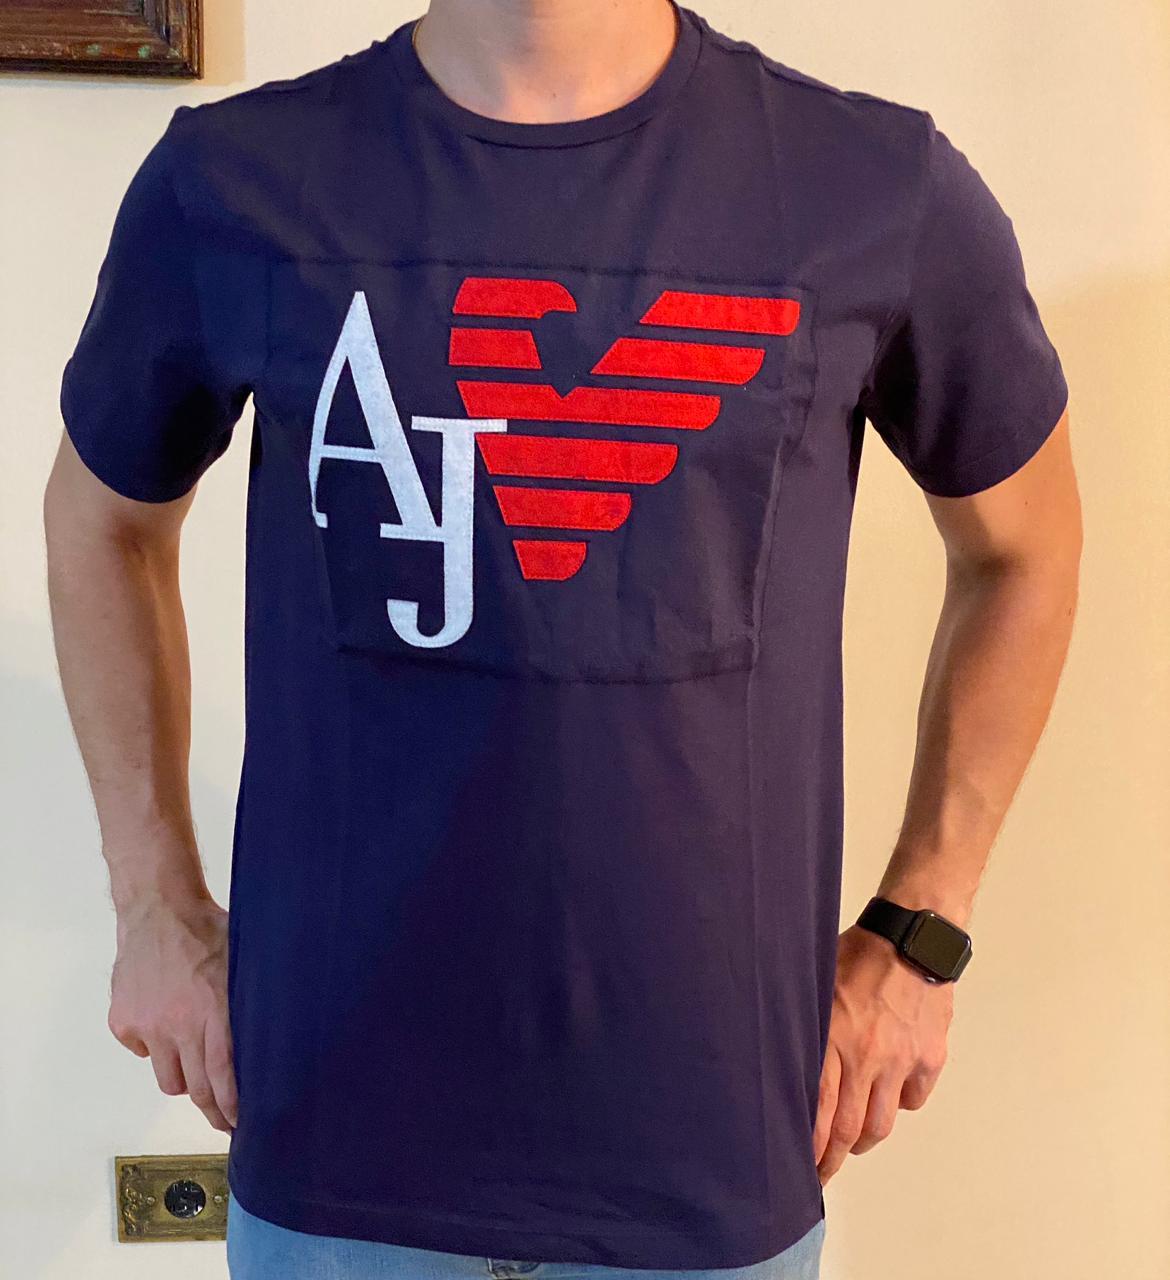 Camiseta Masculina Armani Jeans Algodão Lisa - Azul Marinho